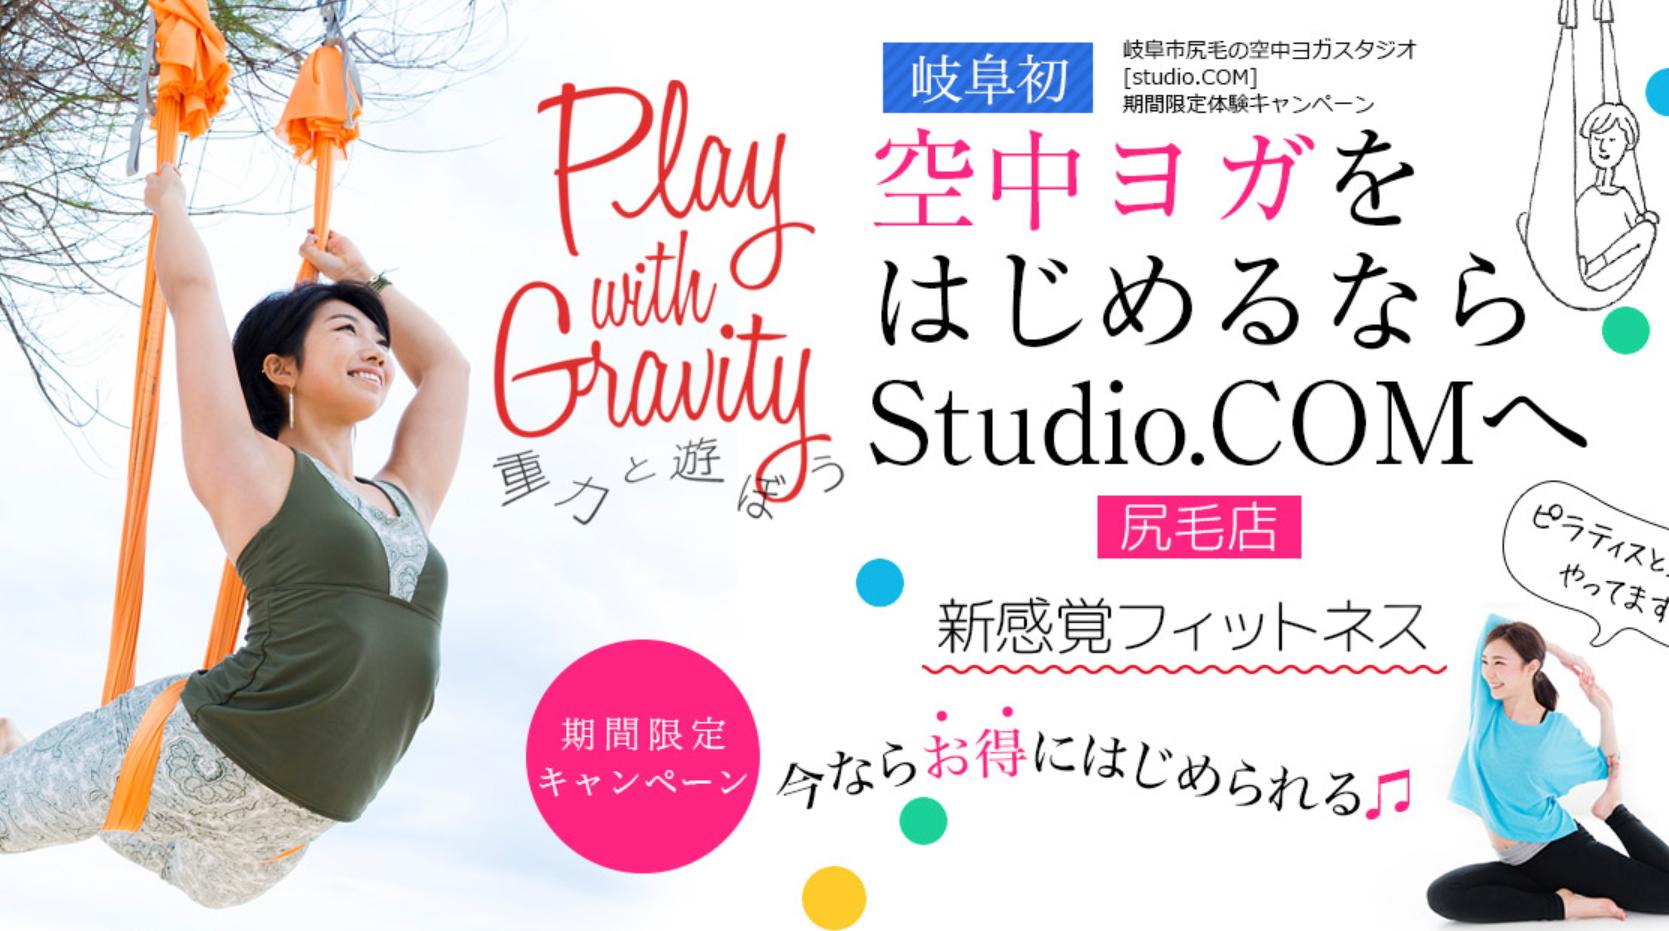 studio. COMで空中ヨガを行う女性